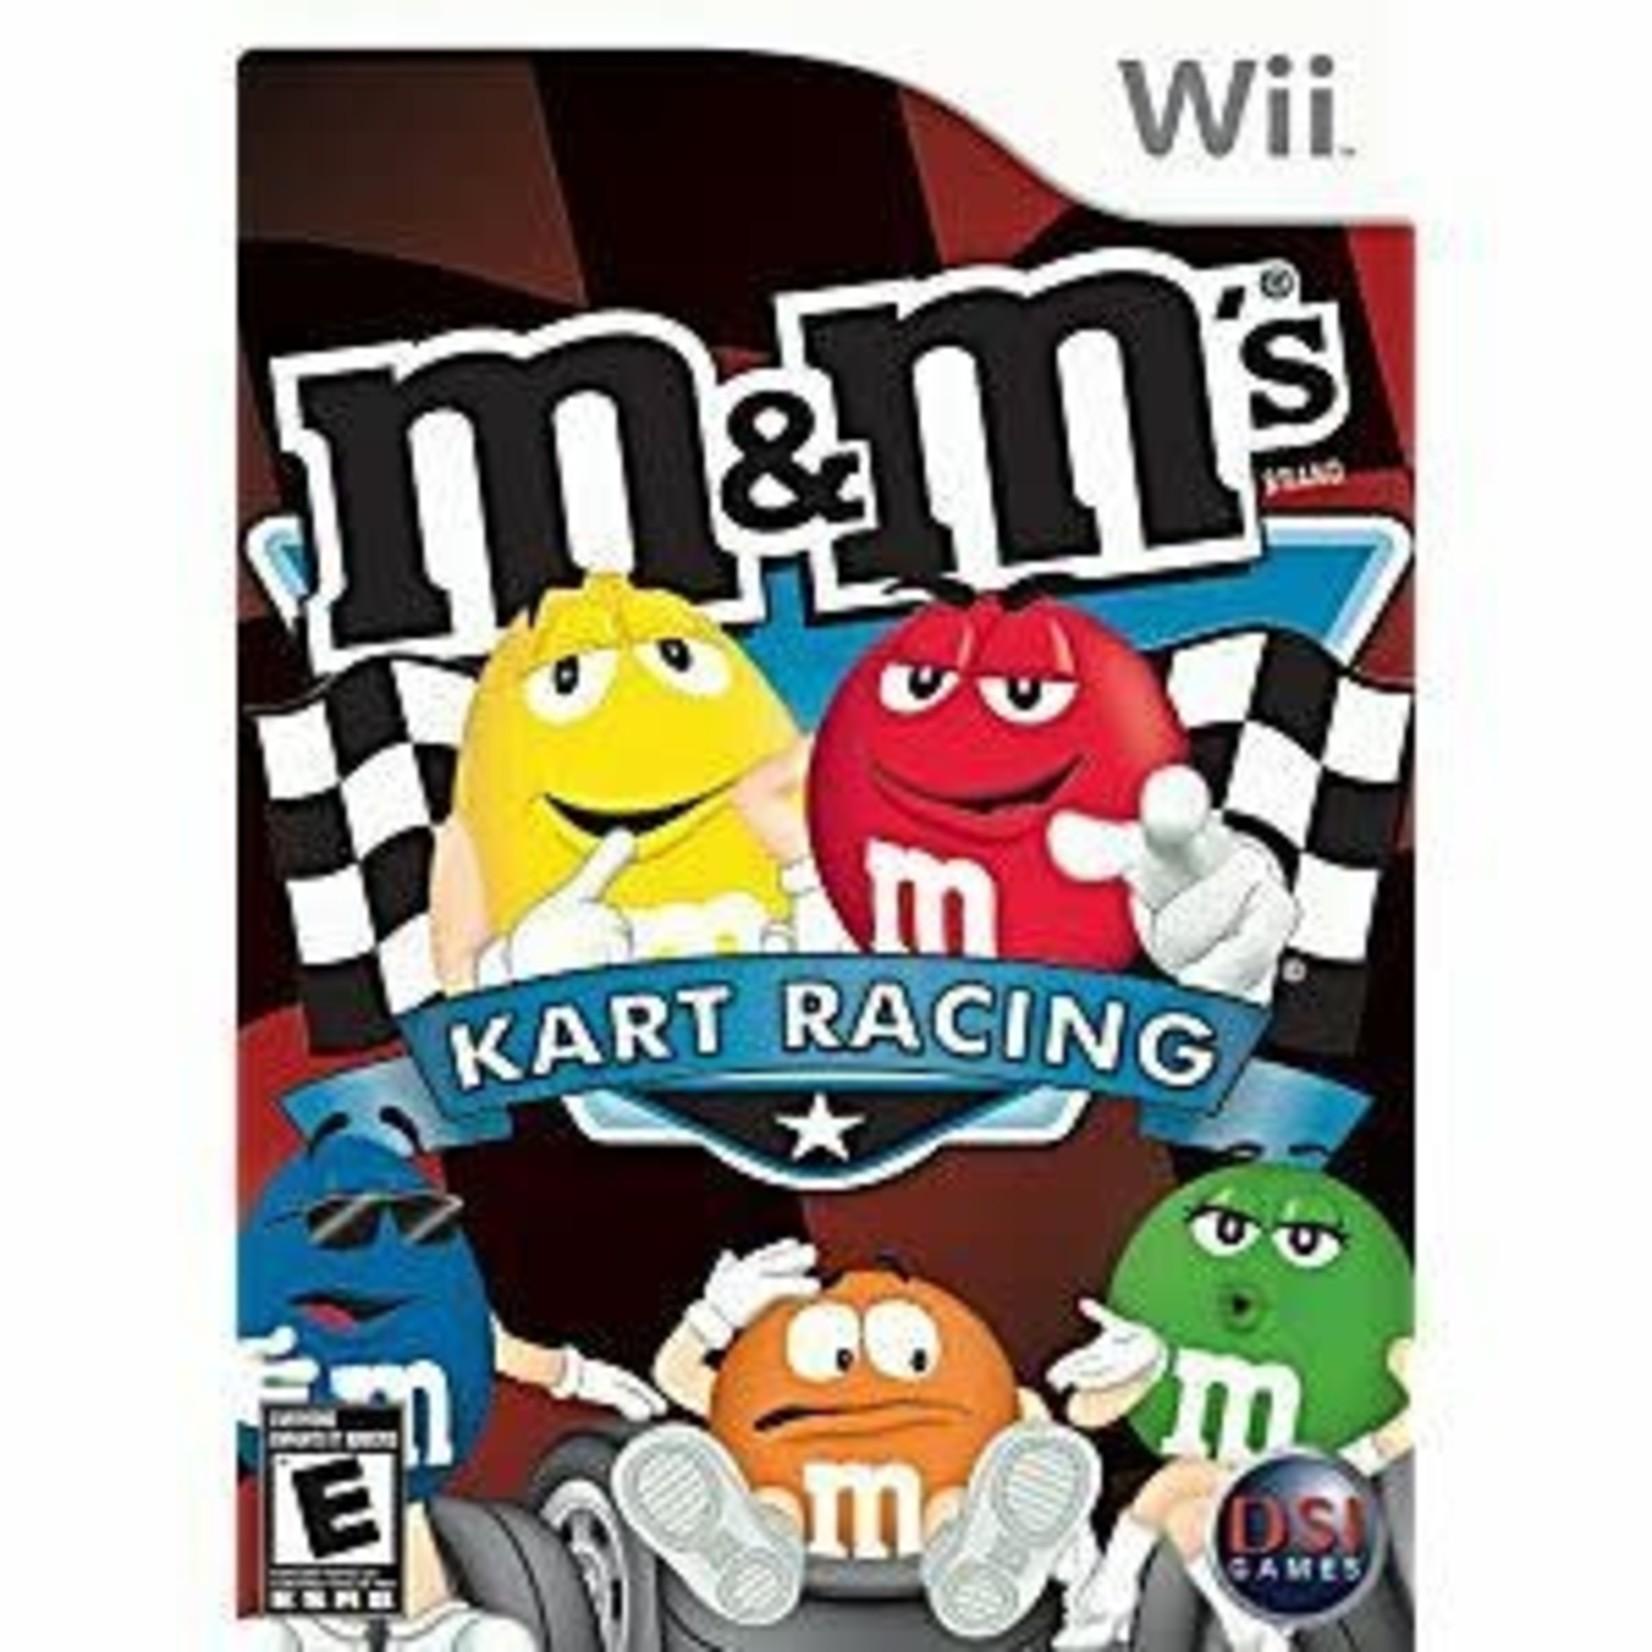 wiiusd-M&M's Kart Racing